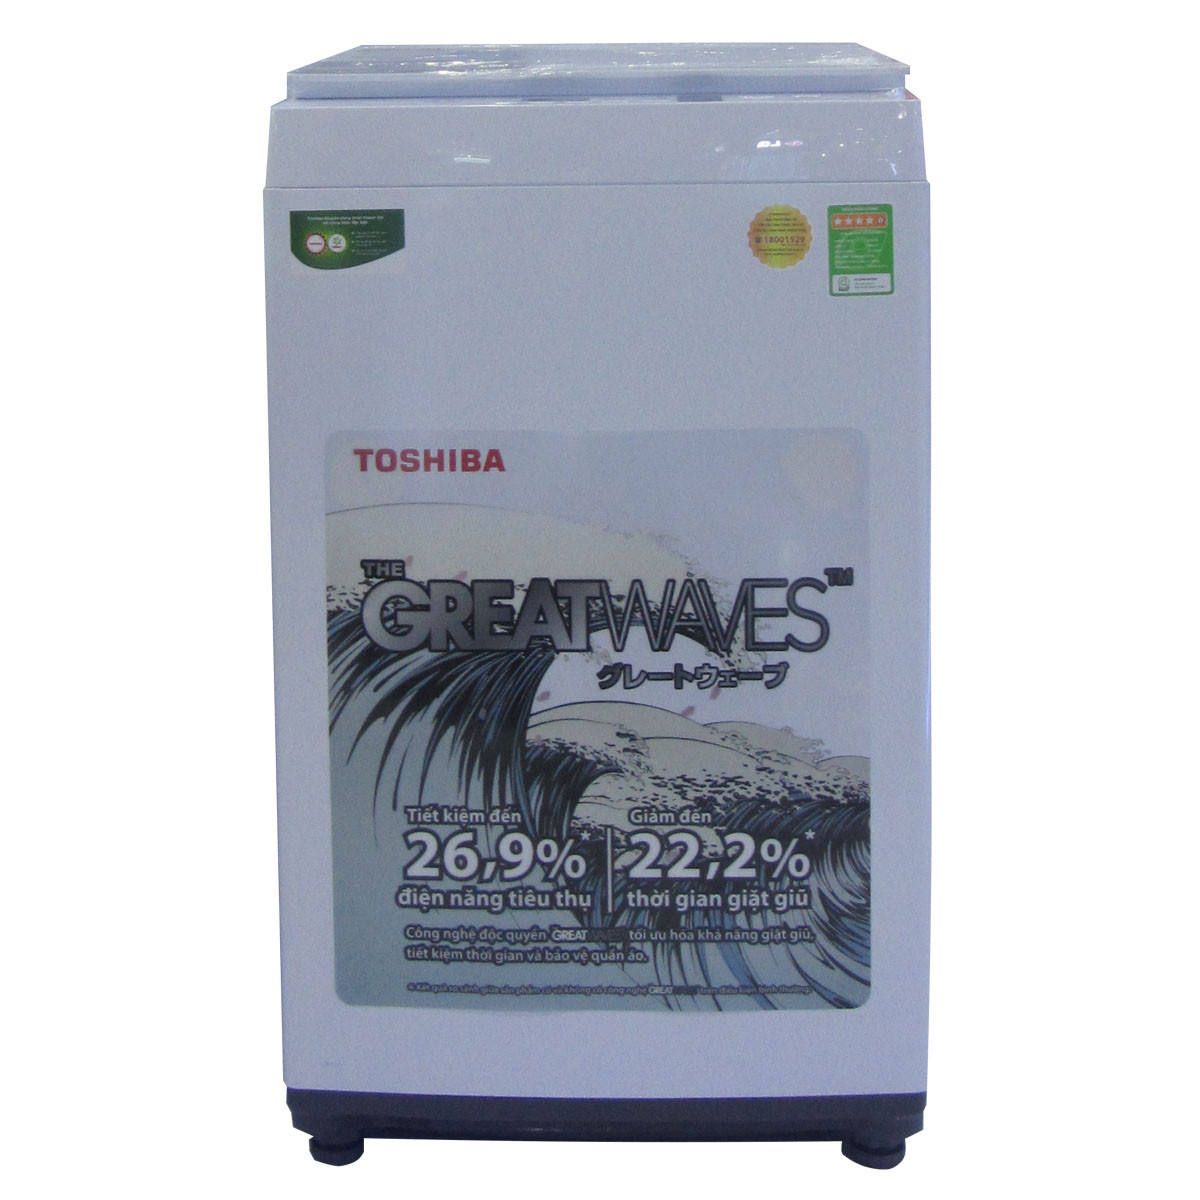 Máy giặt Toshiba 8 kg AW-K800AV WW - HÀNG CHÍNH HÃNG